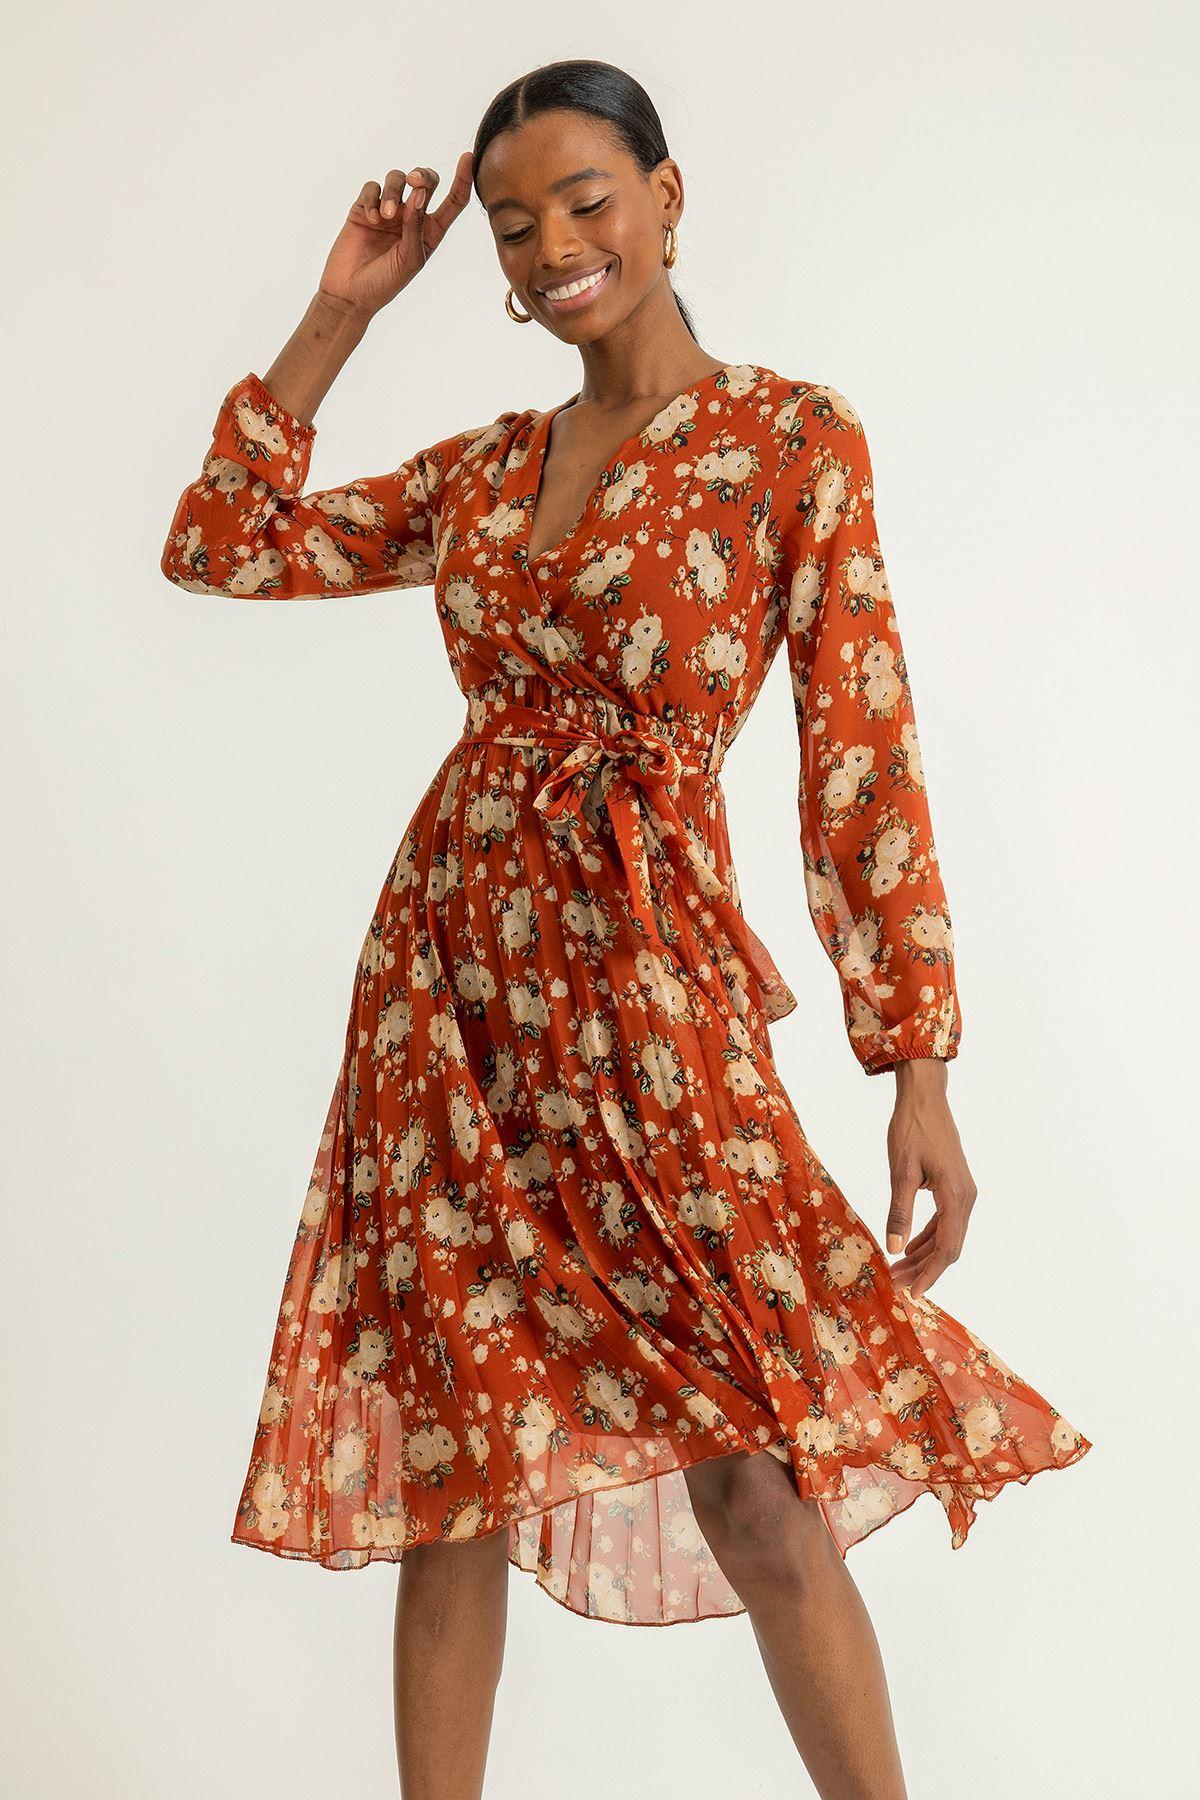 Gül Desen Piliseli Elbise-Kiremit